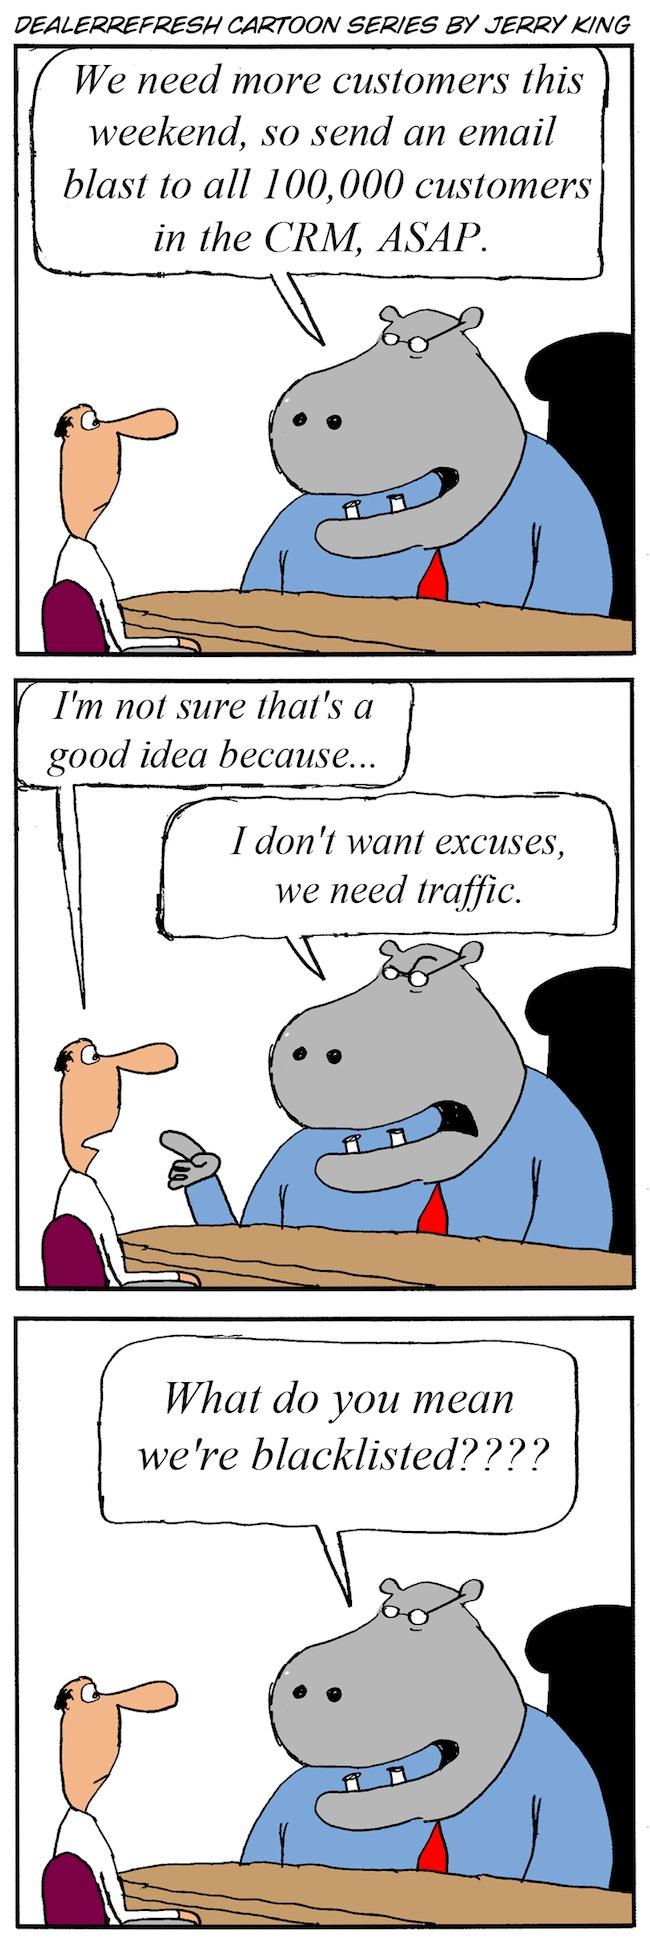 Email Blast Excuses Cartoon